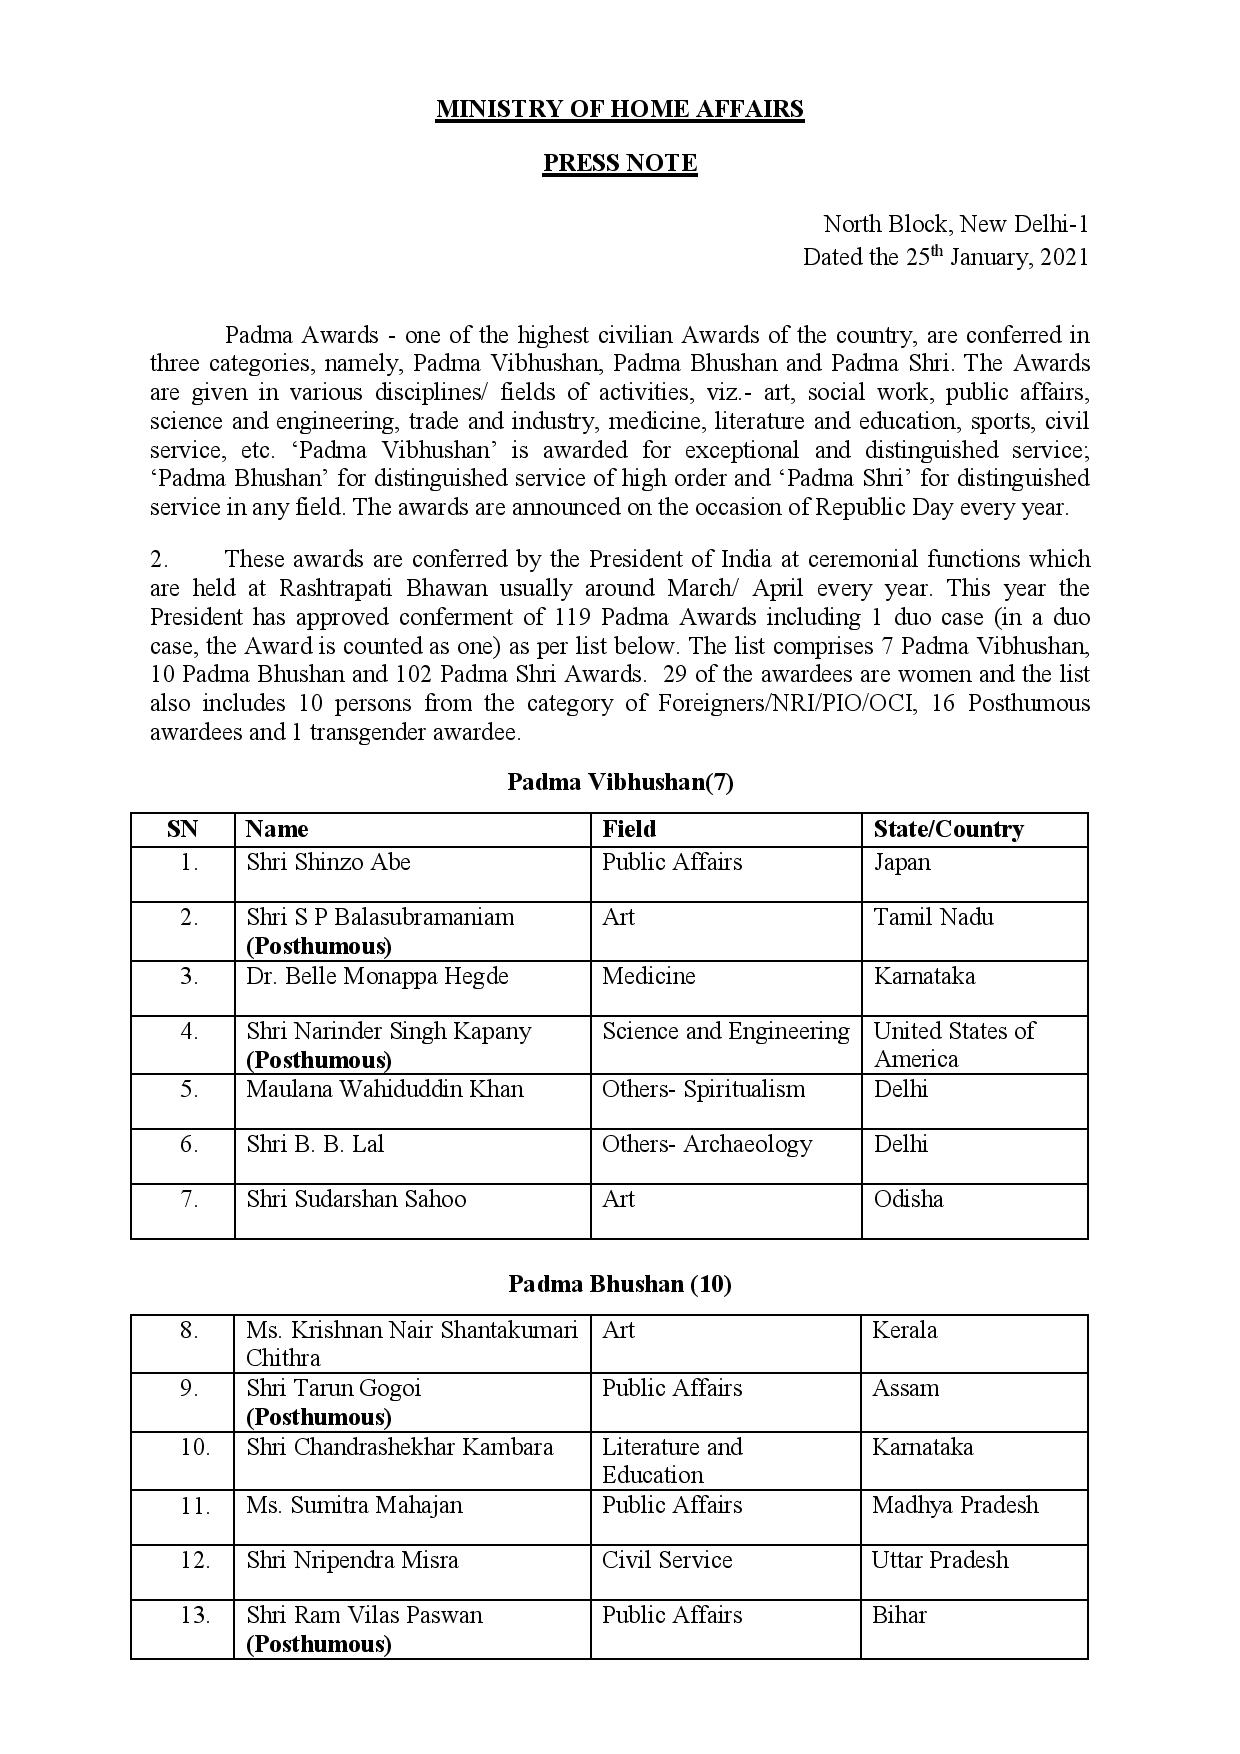 List of Padama Award